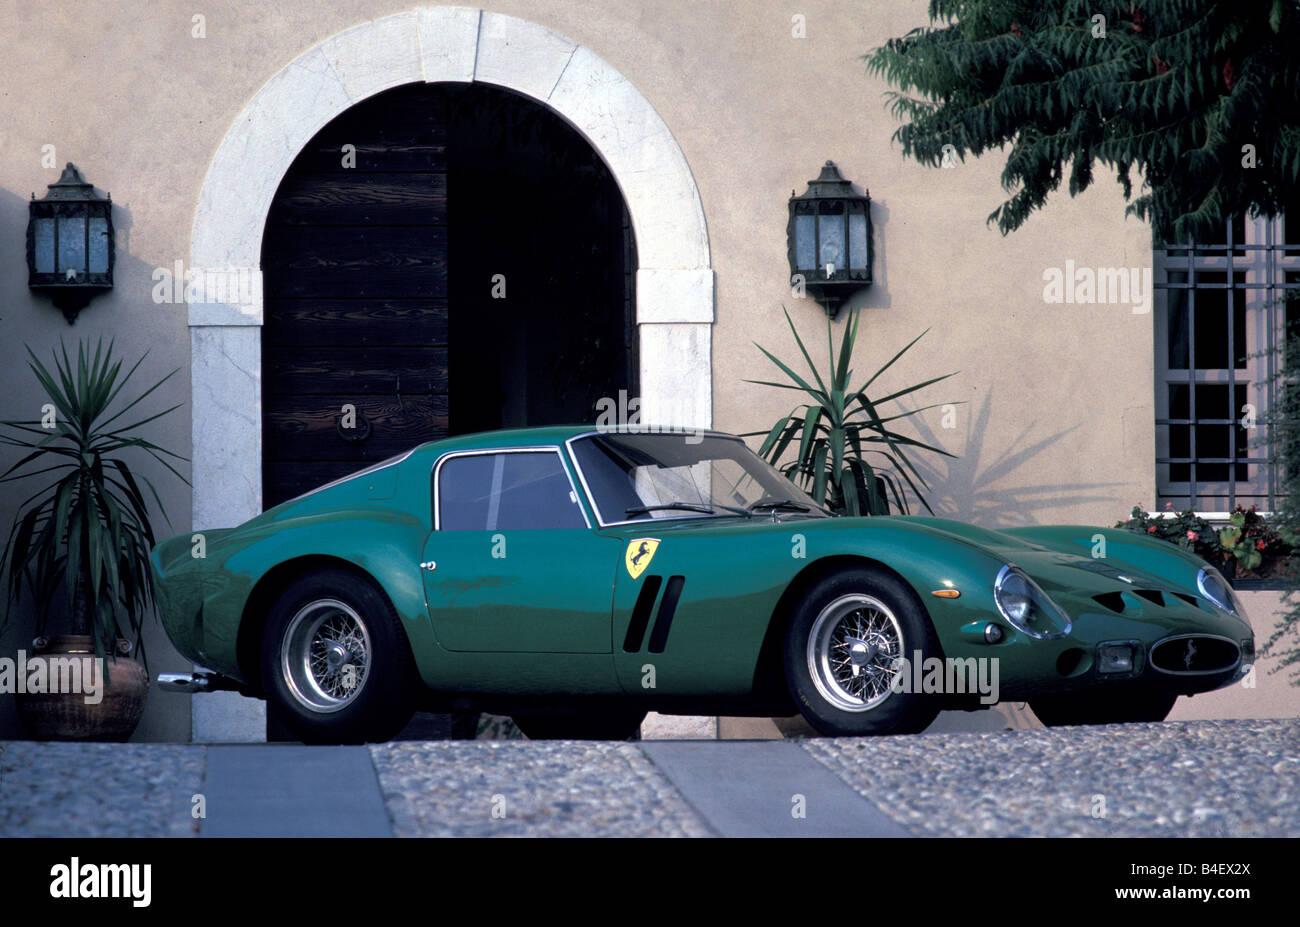 Car Ferrari 250 Gto Model Year 1962 1964 1960s Sixties Vintage Stock Photo Alamy